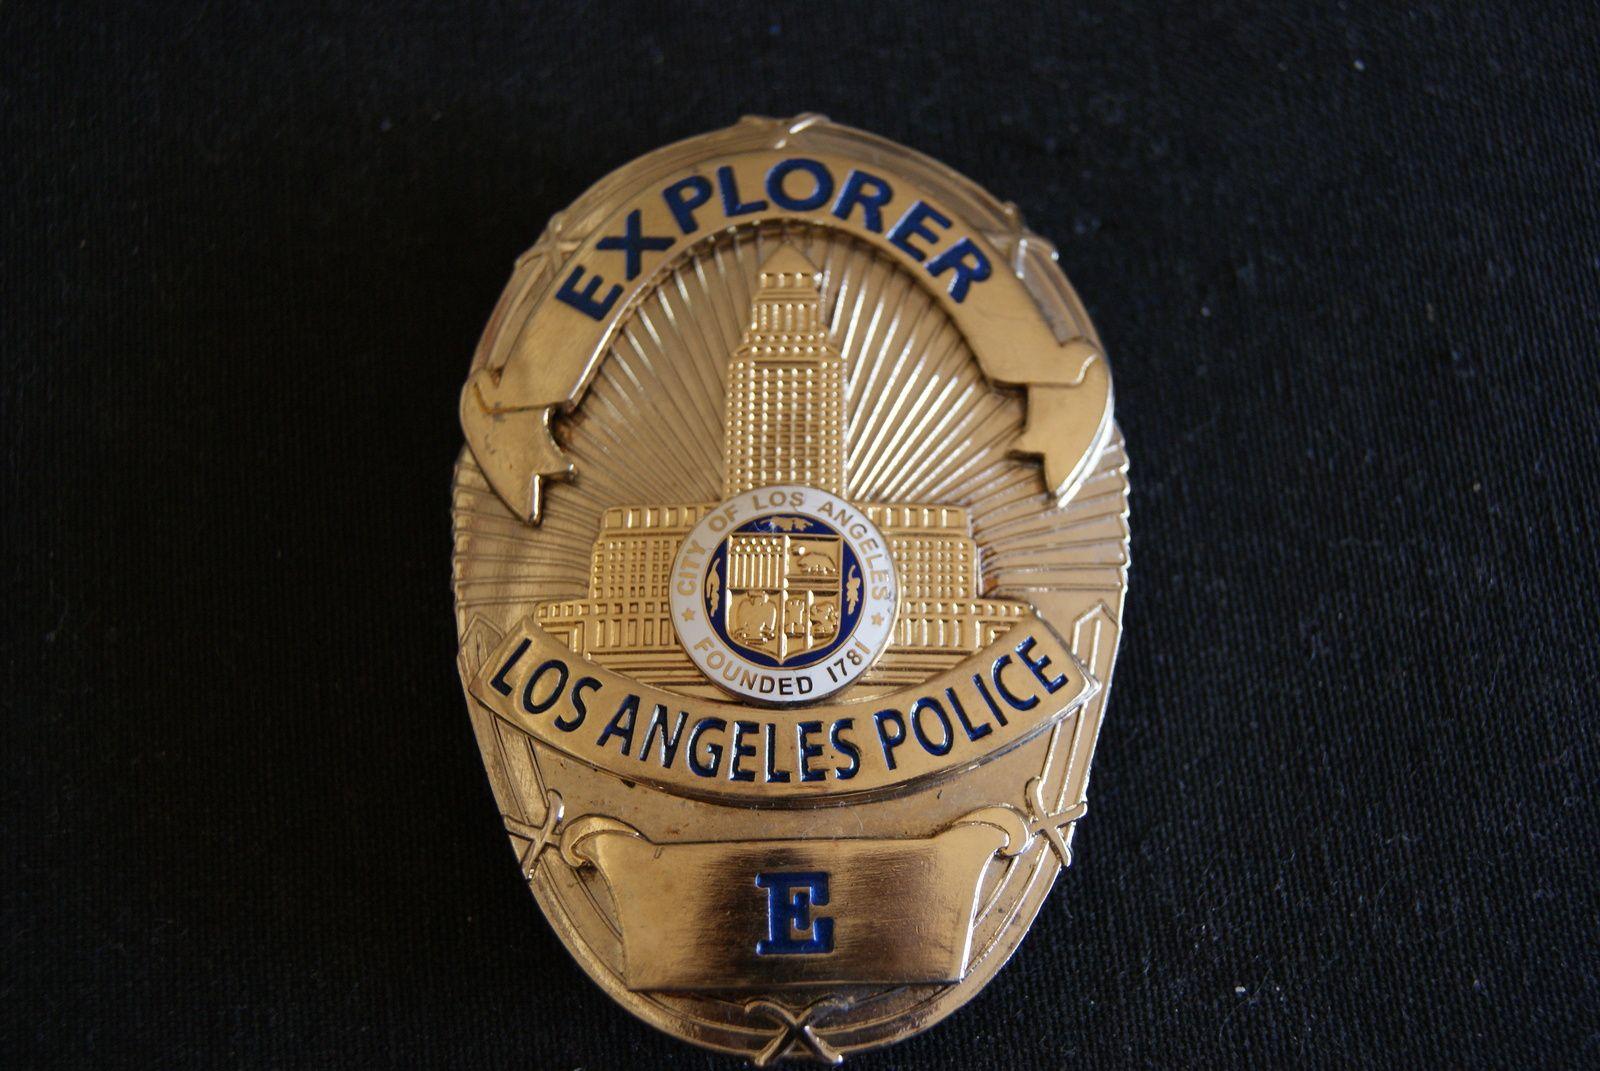 Los Angeles Police Explorer Police Badge Defunct Program Since 2009 Obsolete Police Badge Badge Movie Prop Badges